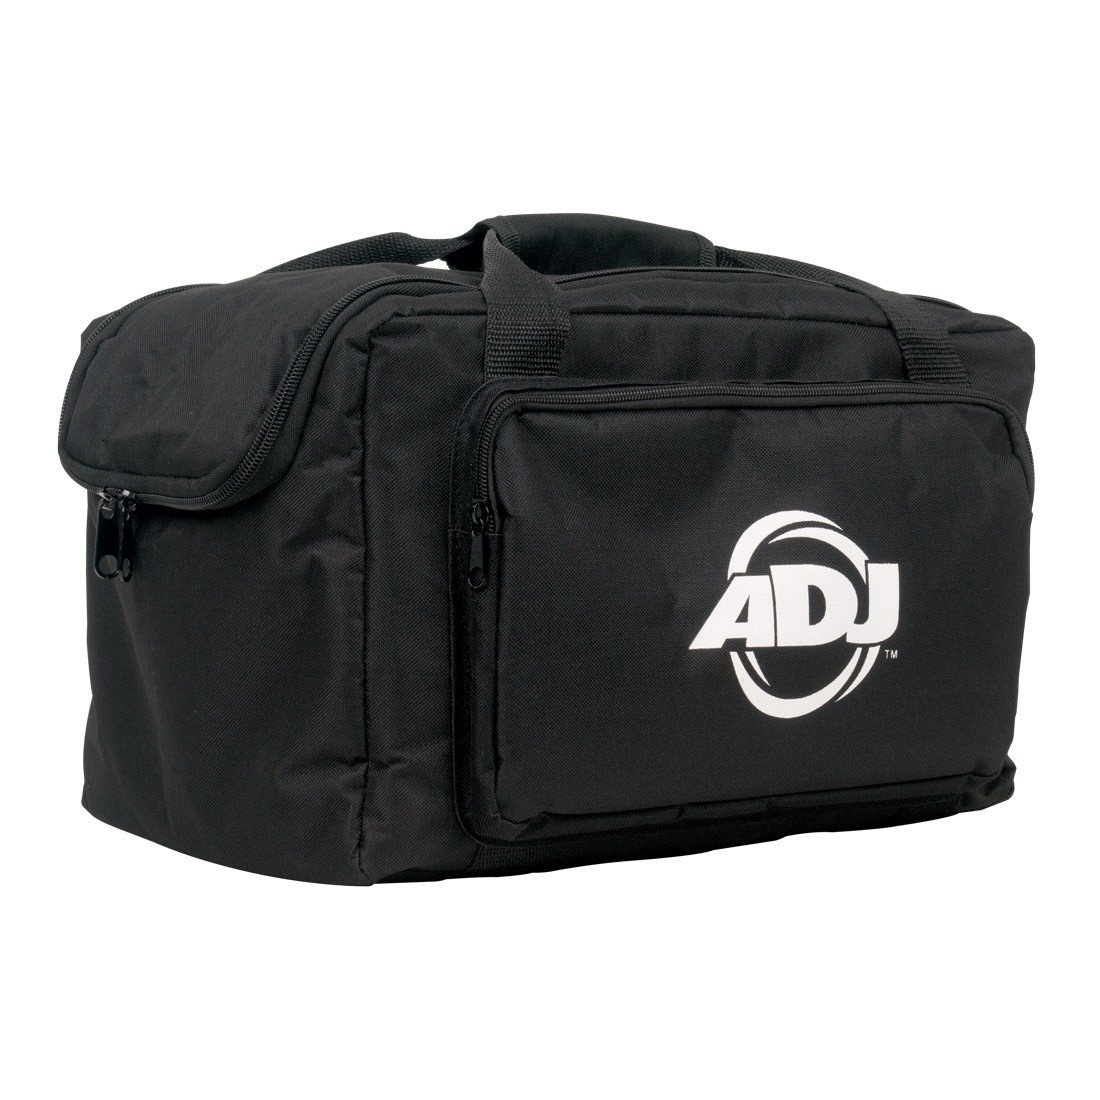 american-dj-f4-par-bag.jpg